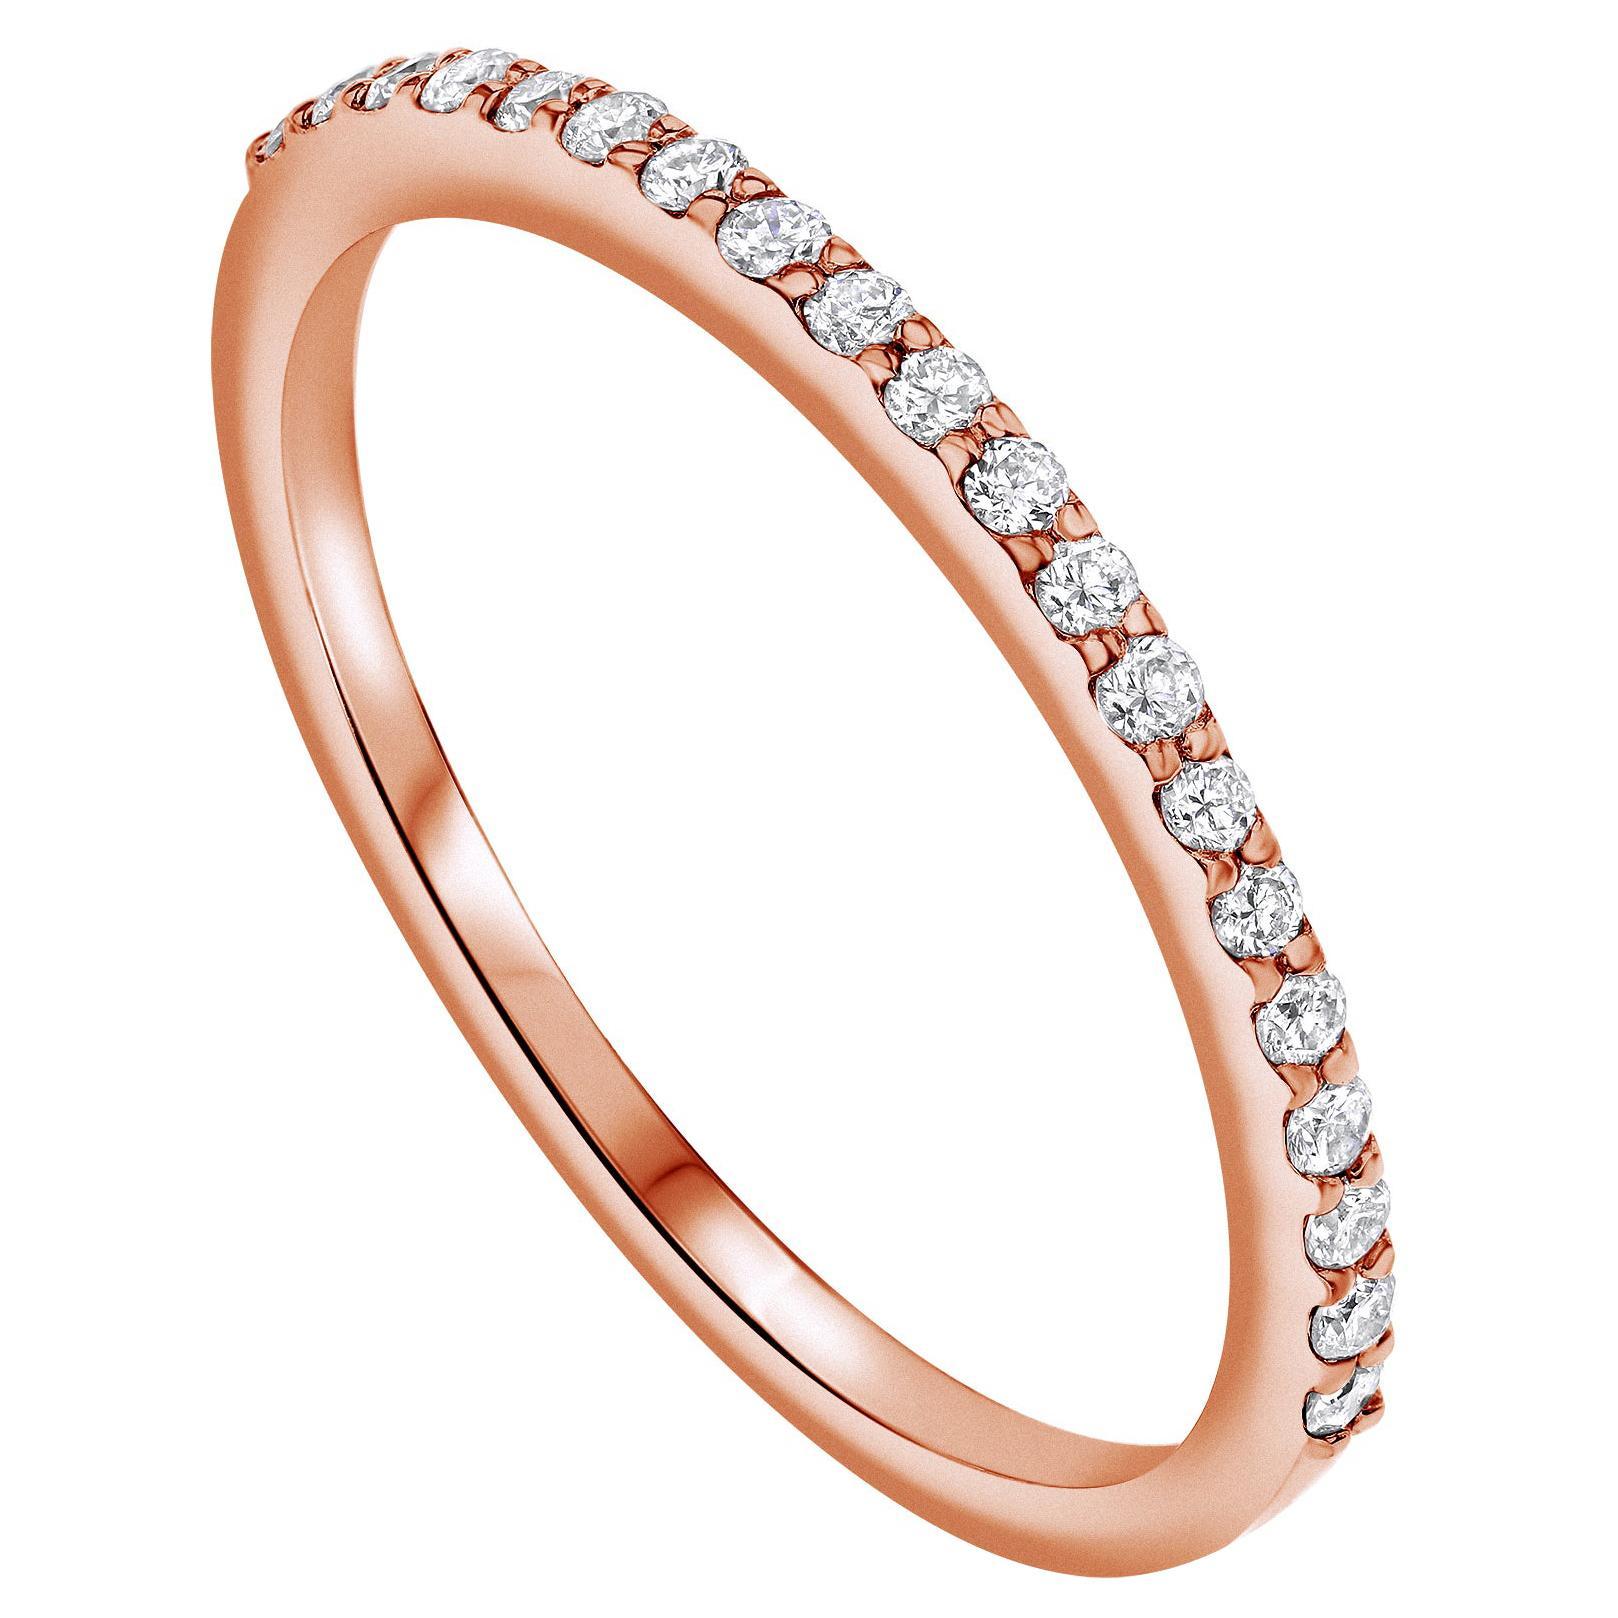 Half Eternity 0.15 Carat Diamond Ring in 14K Rose Gold - Shlomit Rogel